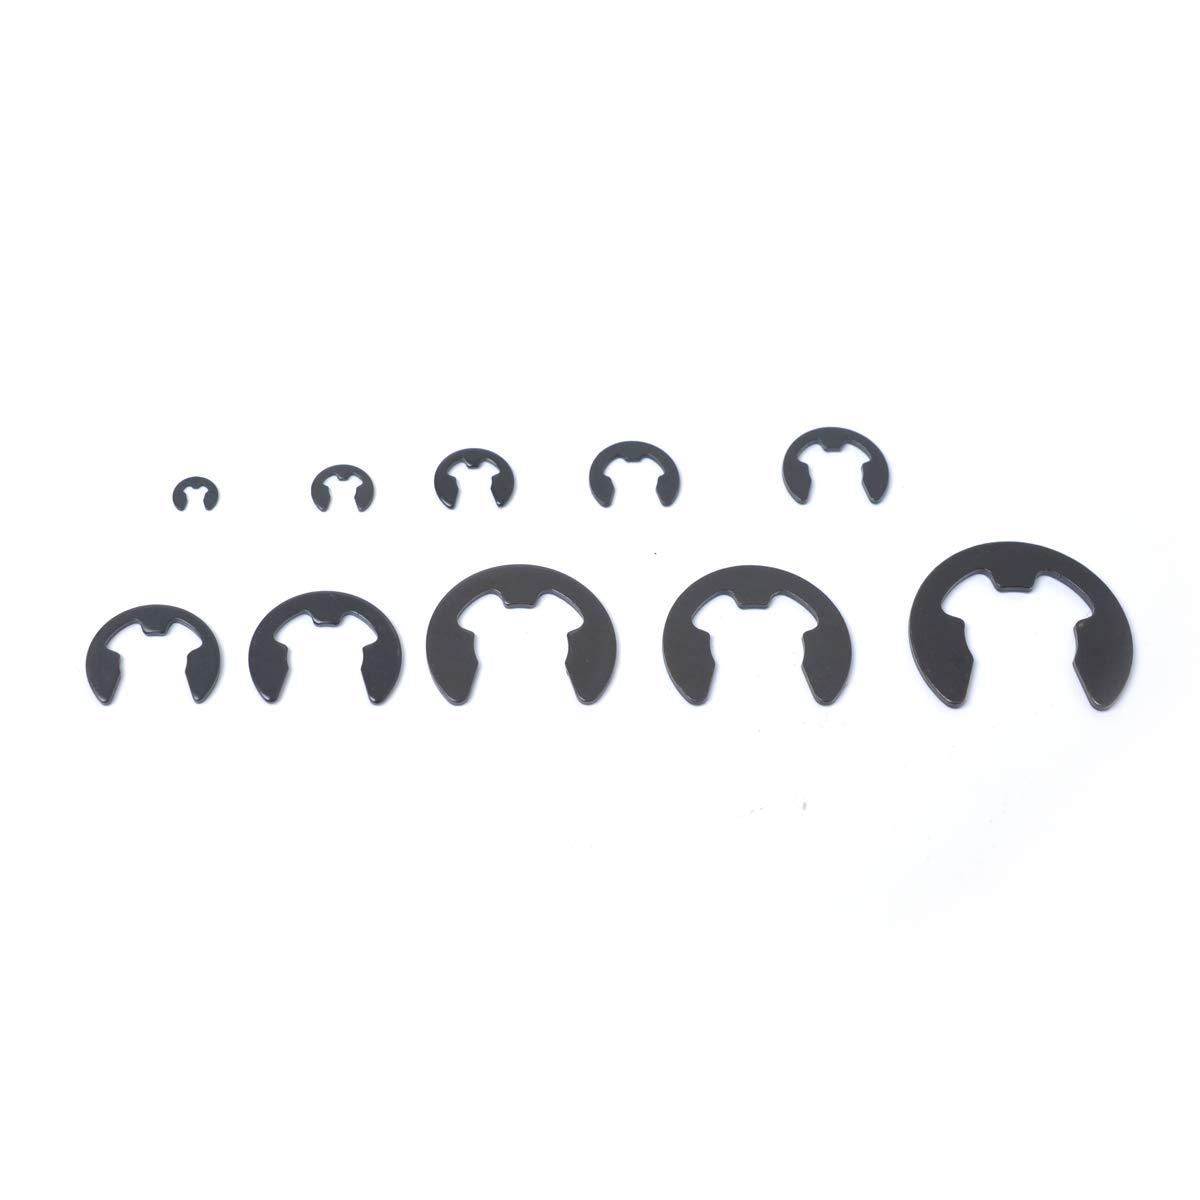 160Pcs E-Clip Retaining Ring Snap Ring Assortment Kit 2 3 4 5 6 7 8 9 10 12 mm Auto Accessories